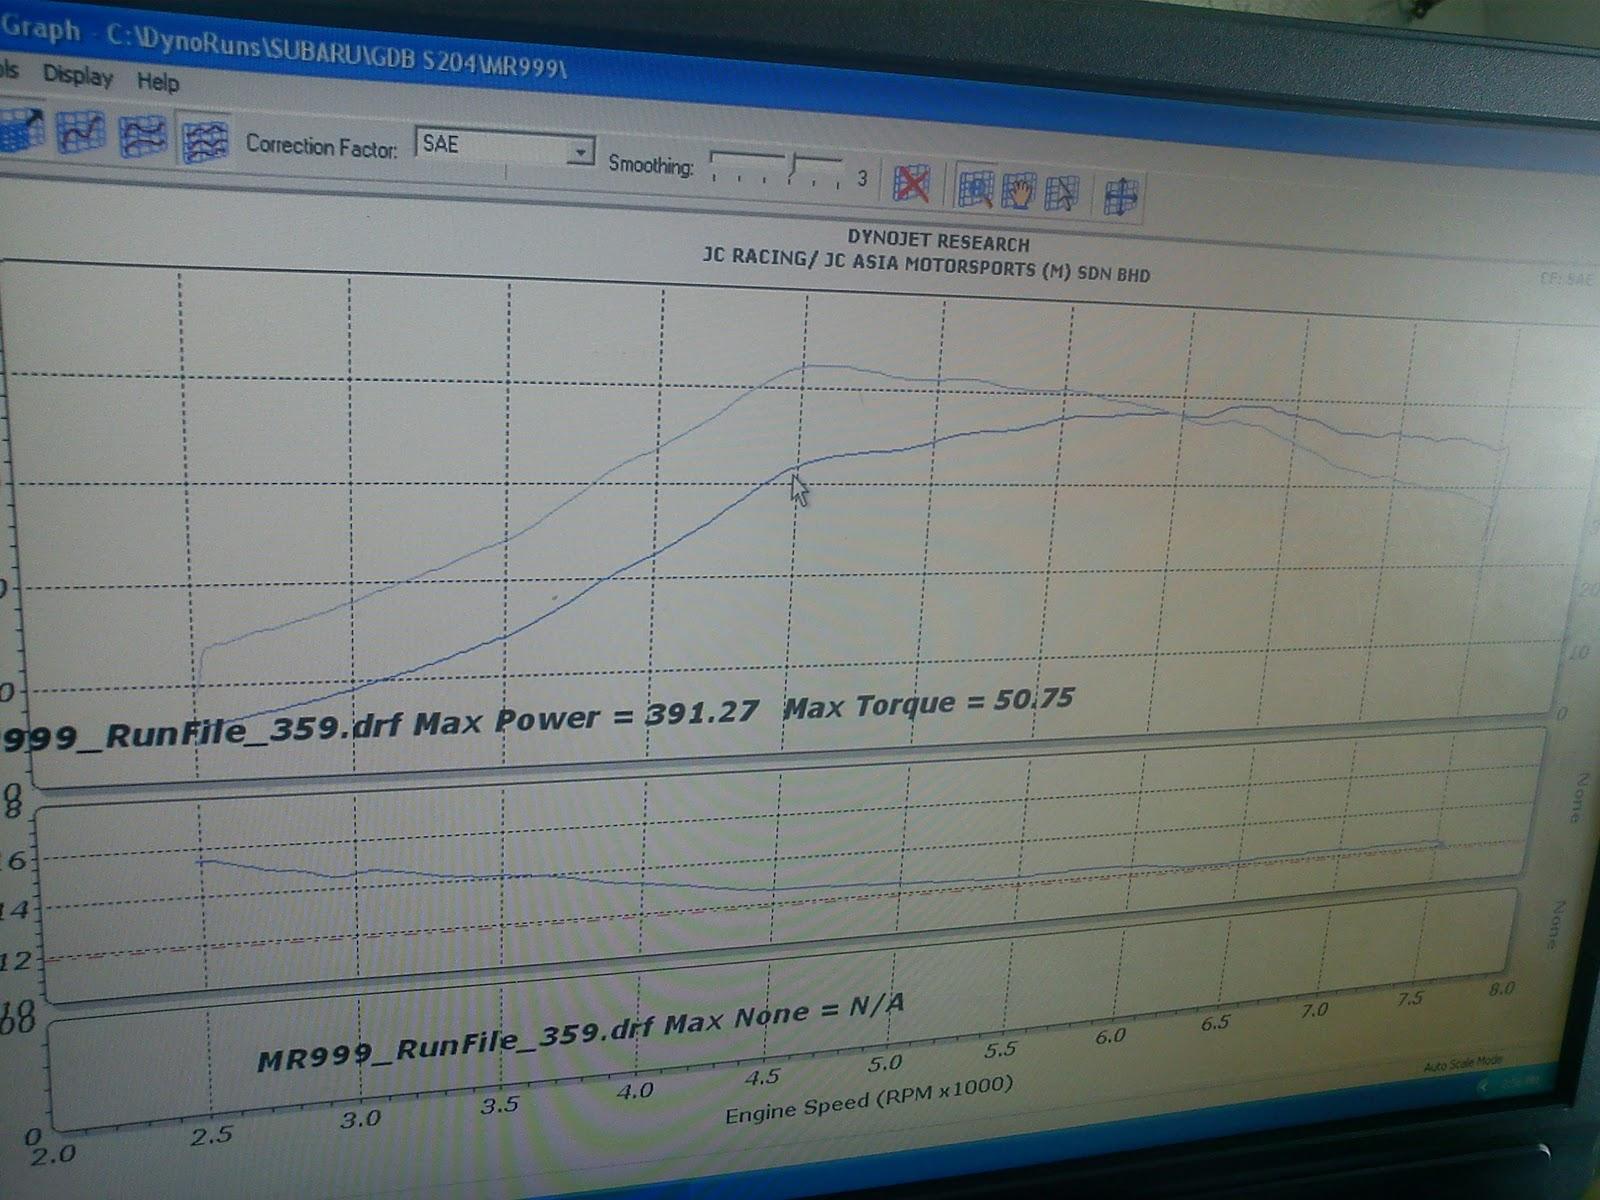 Motoring-Malaysia: Subaru Impreza S204 - This Limited Edition Scooby